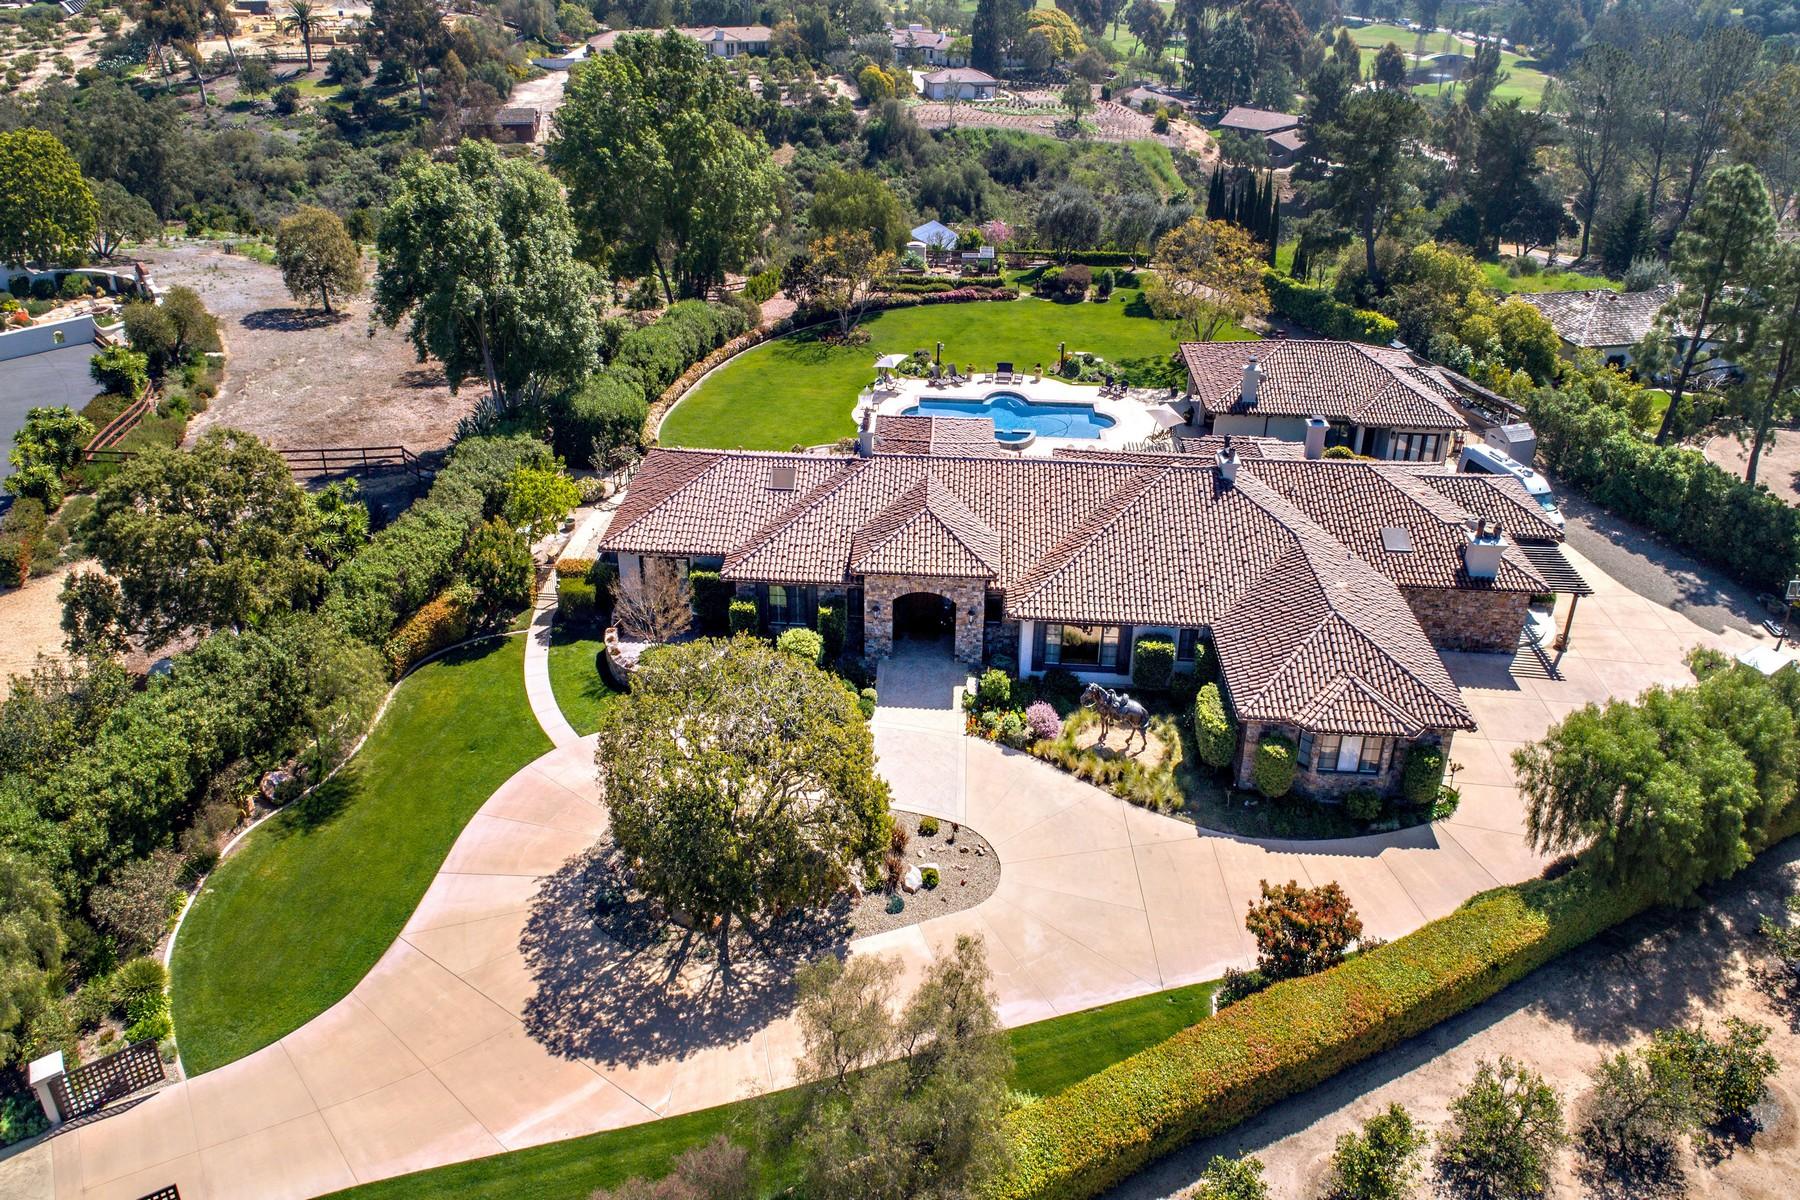 Villa per Vendita alle ore 4843 La Jacaranda Rancho Santa Fe, California, 92067 Stati Uniti